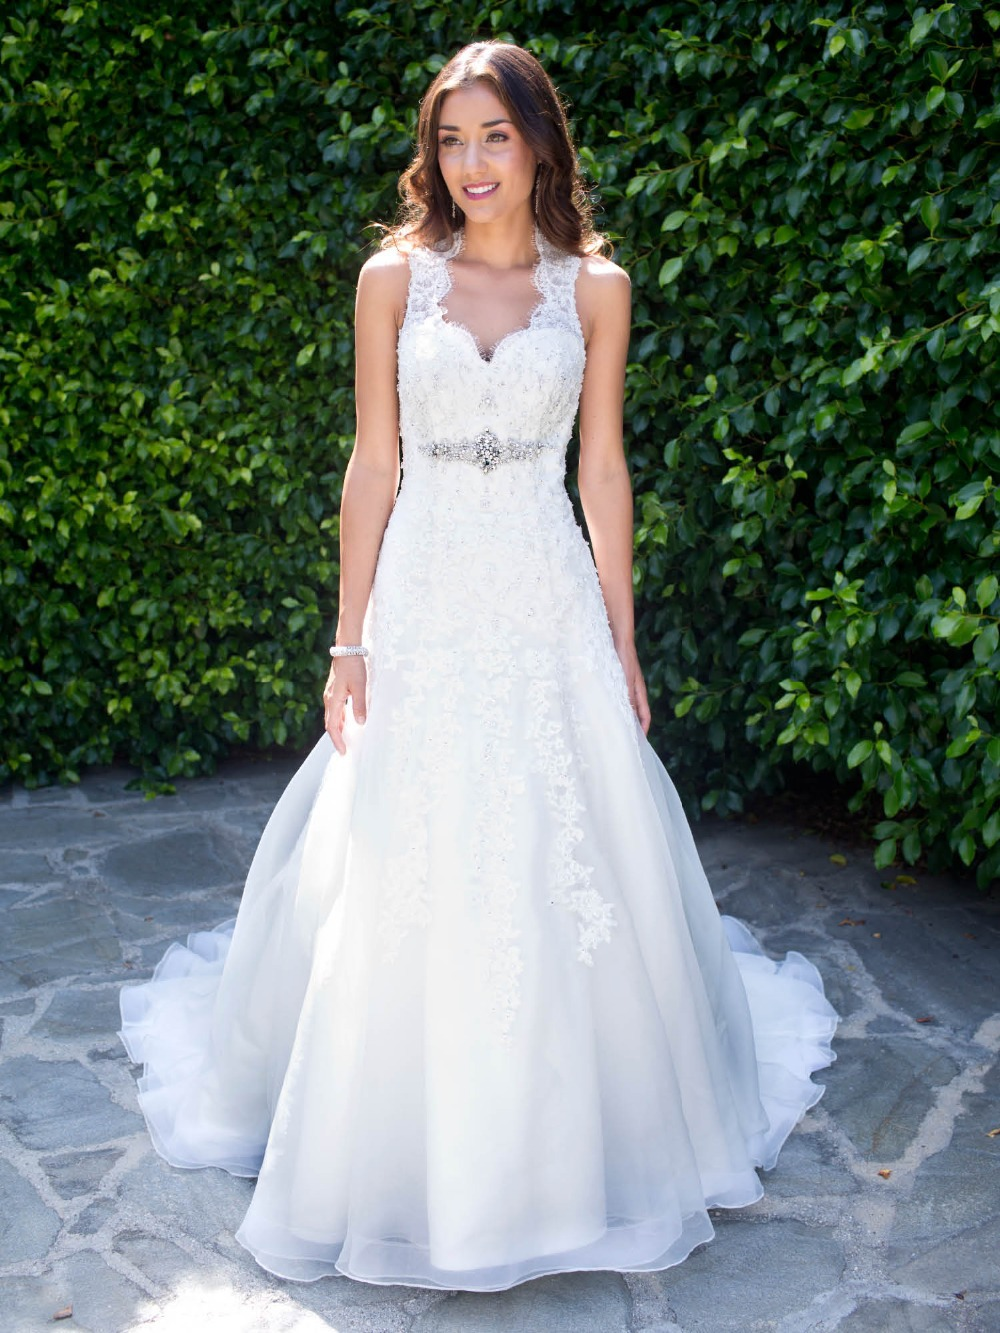 2015 elegant trumpet long wedding dress bridal gown for Trumpet wedding dress with long train